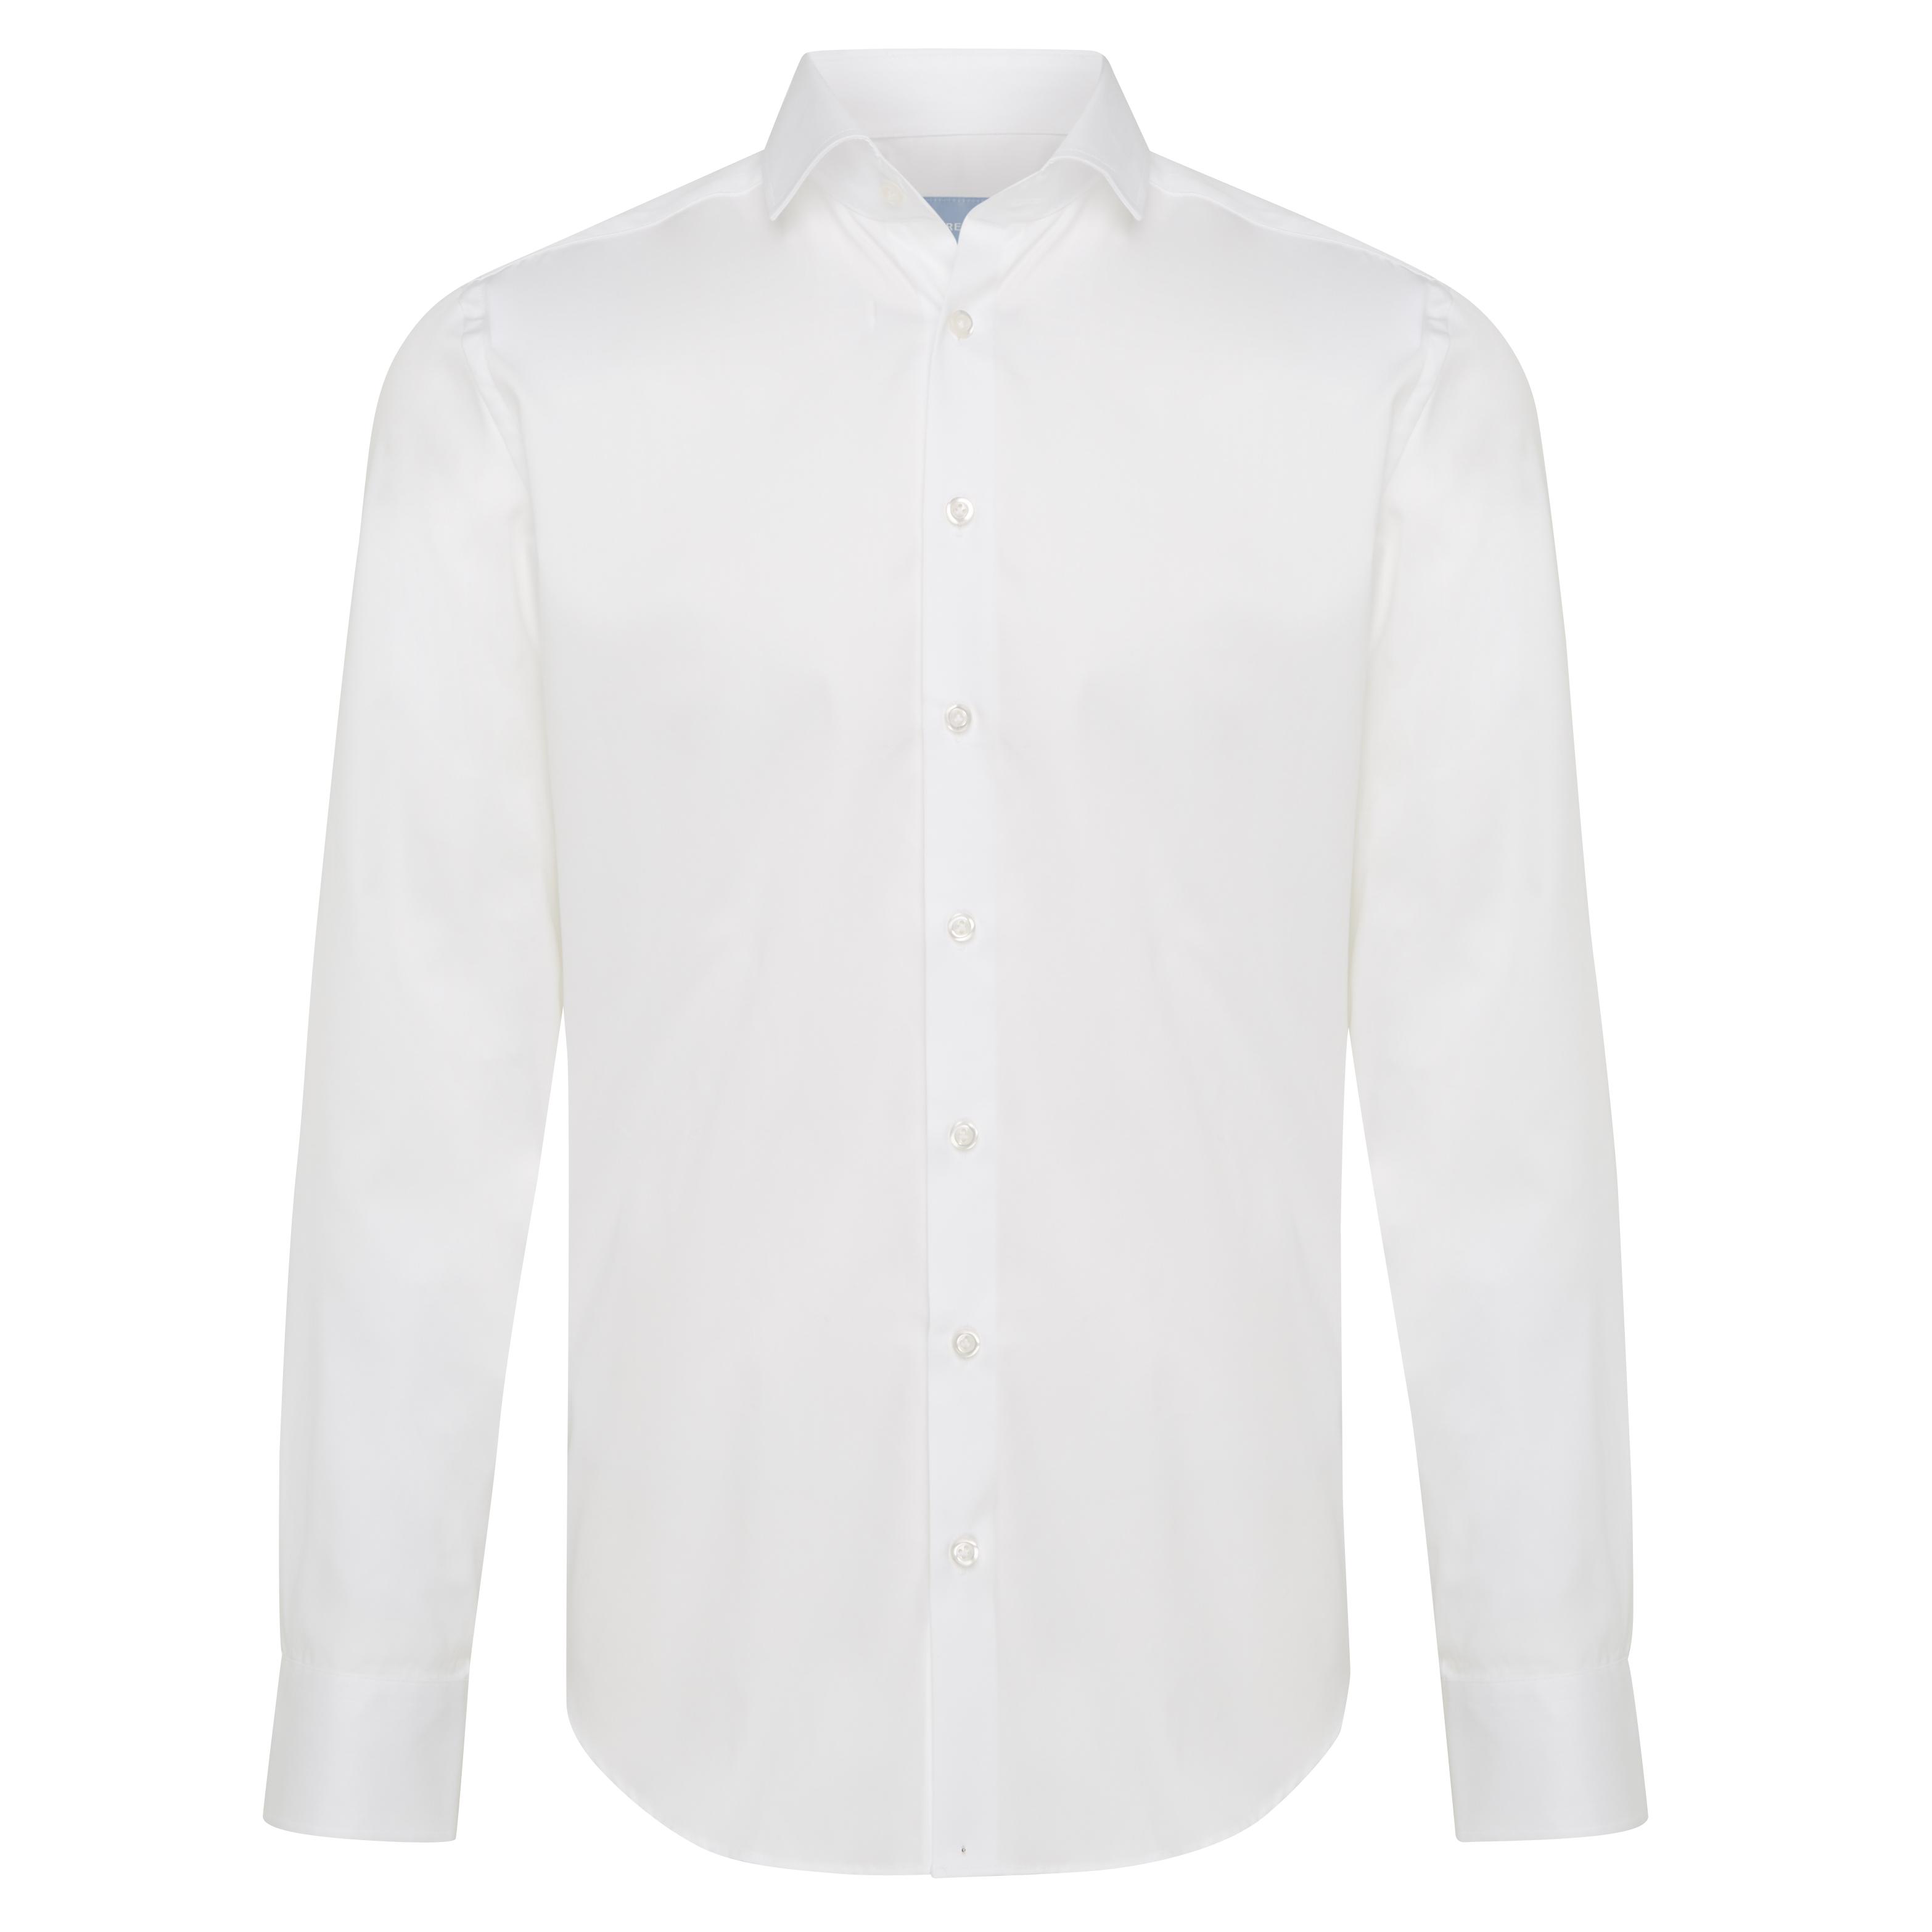 Non-iron shirt plain white - Tailored Fit